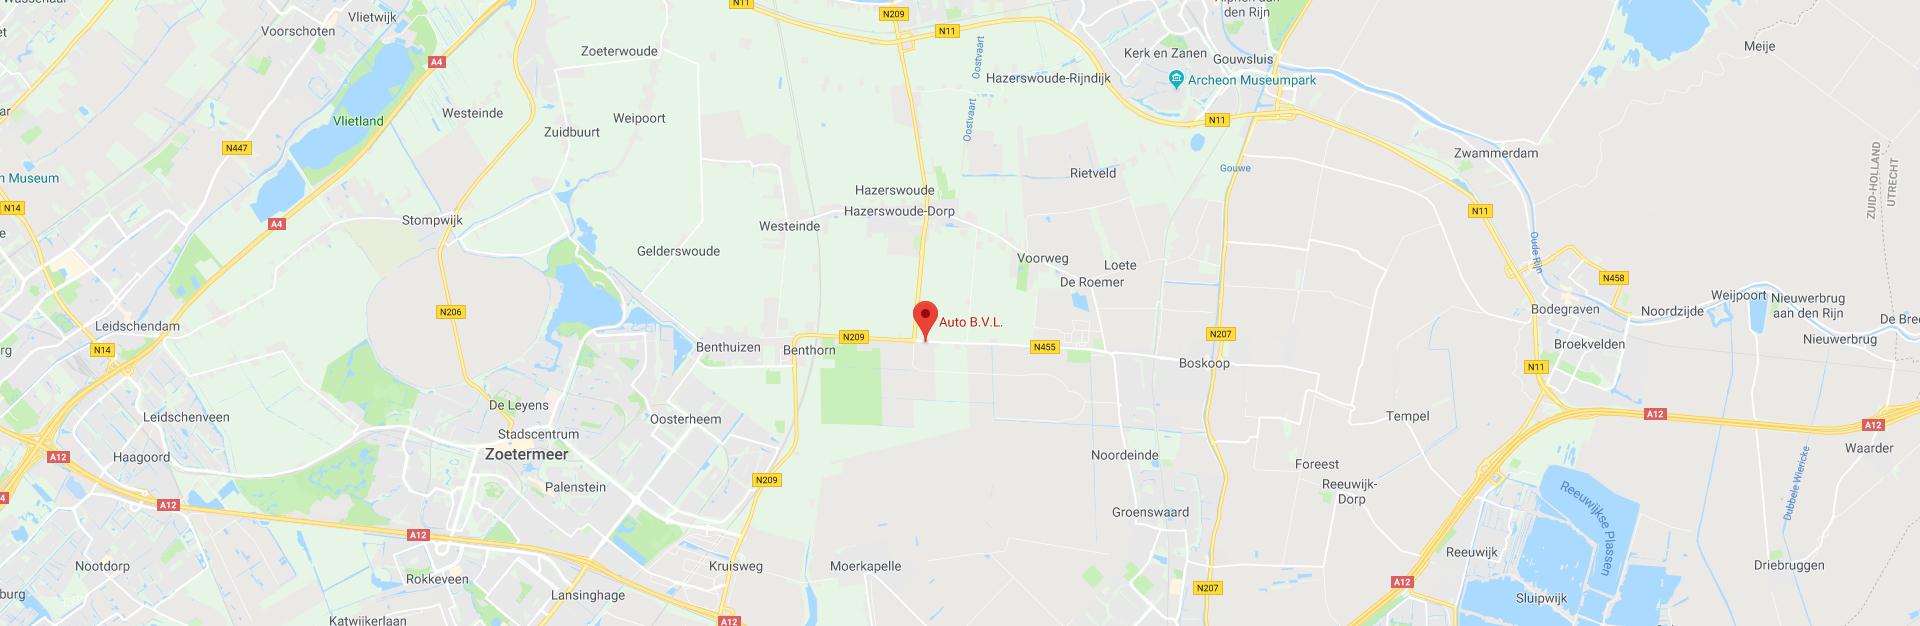 autobvl op google maps